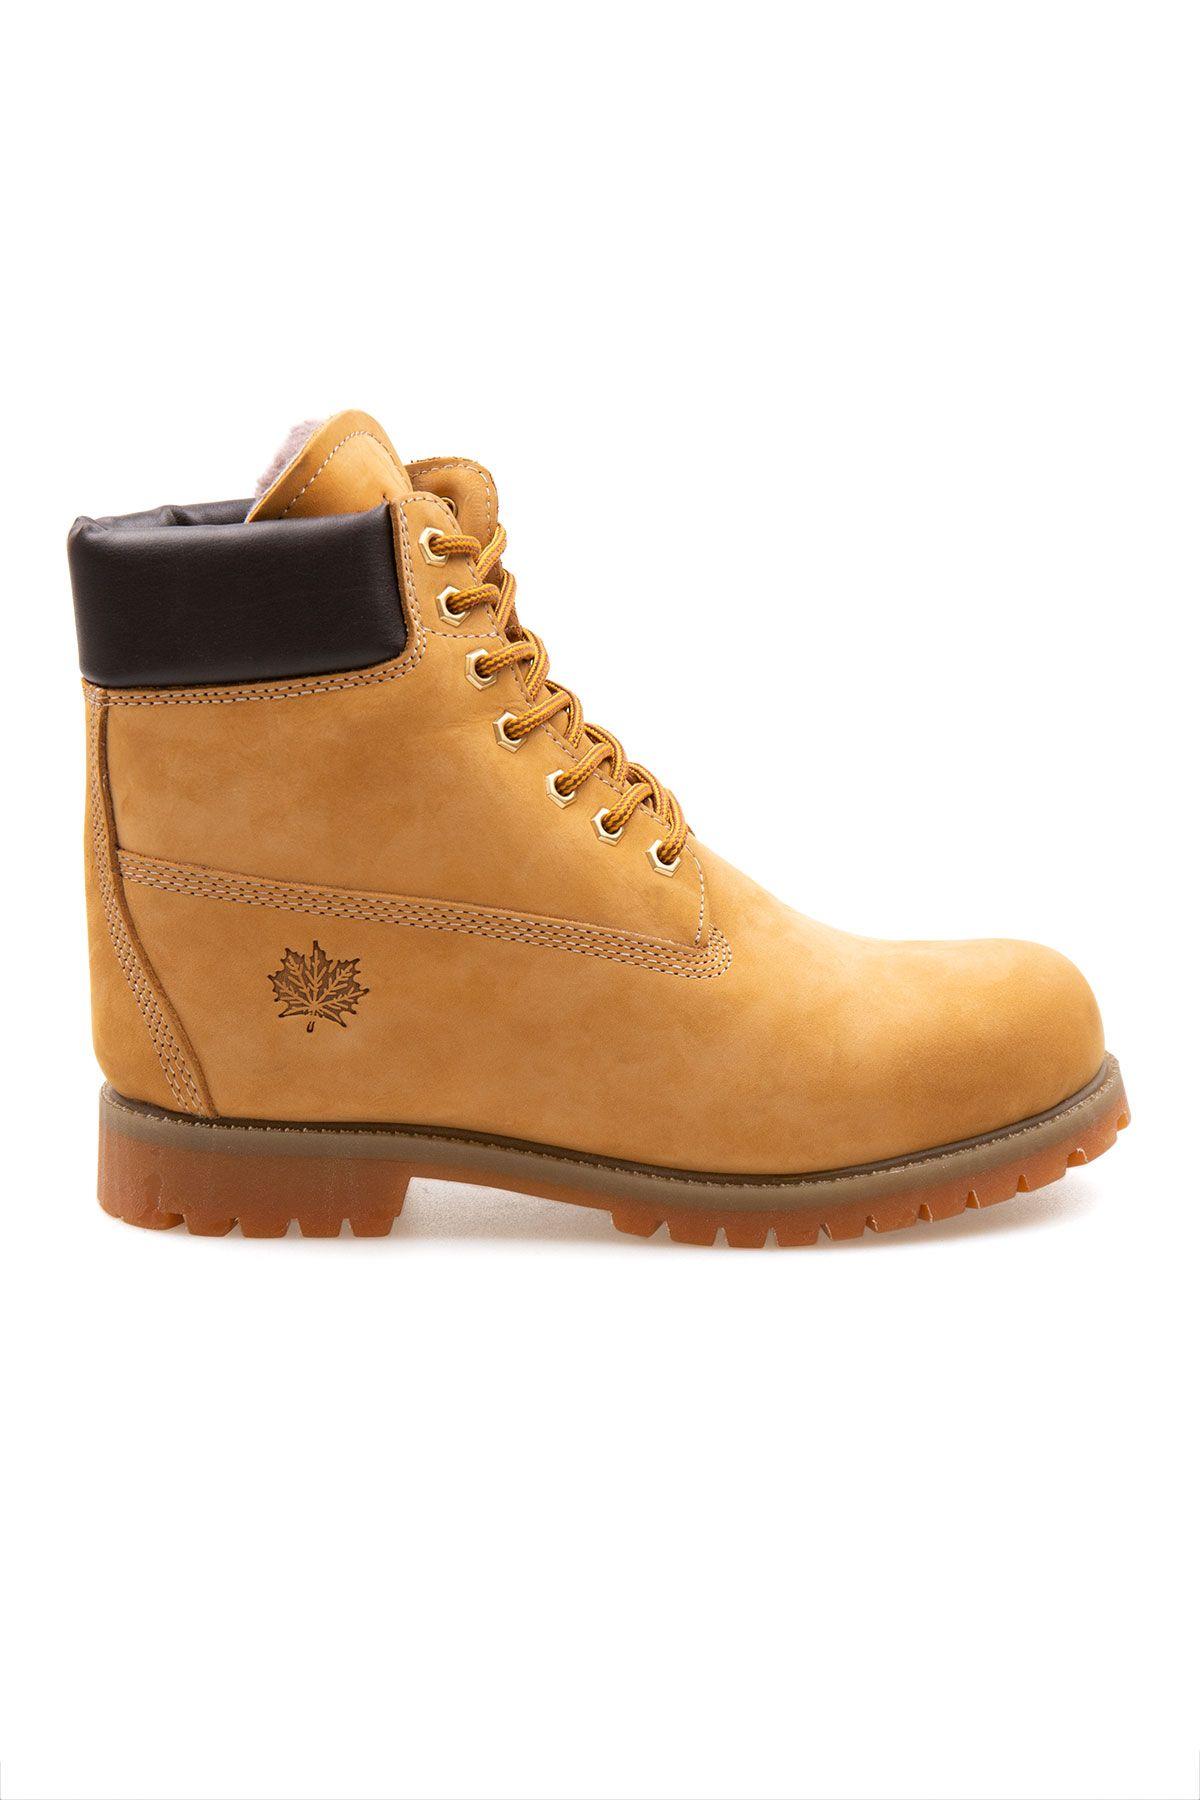 Pegia Genuine Nubuck Men's Boots 500900 Yellow